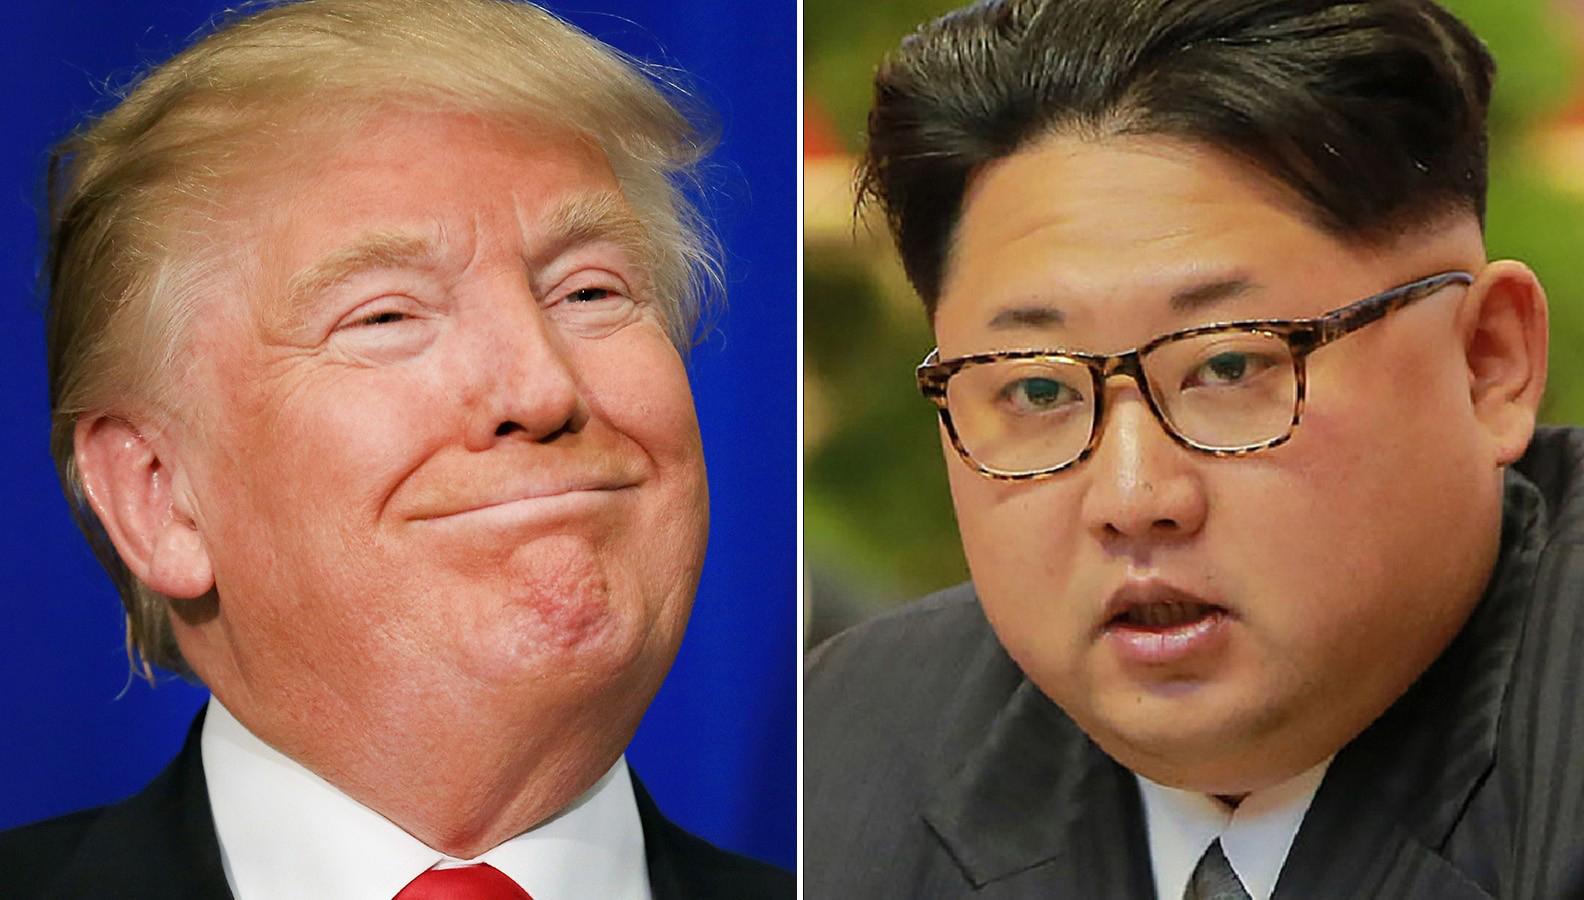 donald trump takes dig at short and fat kim jong un